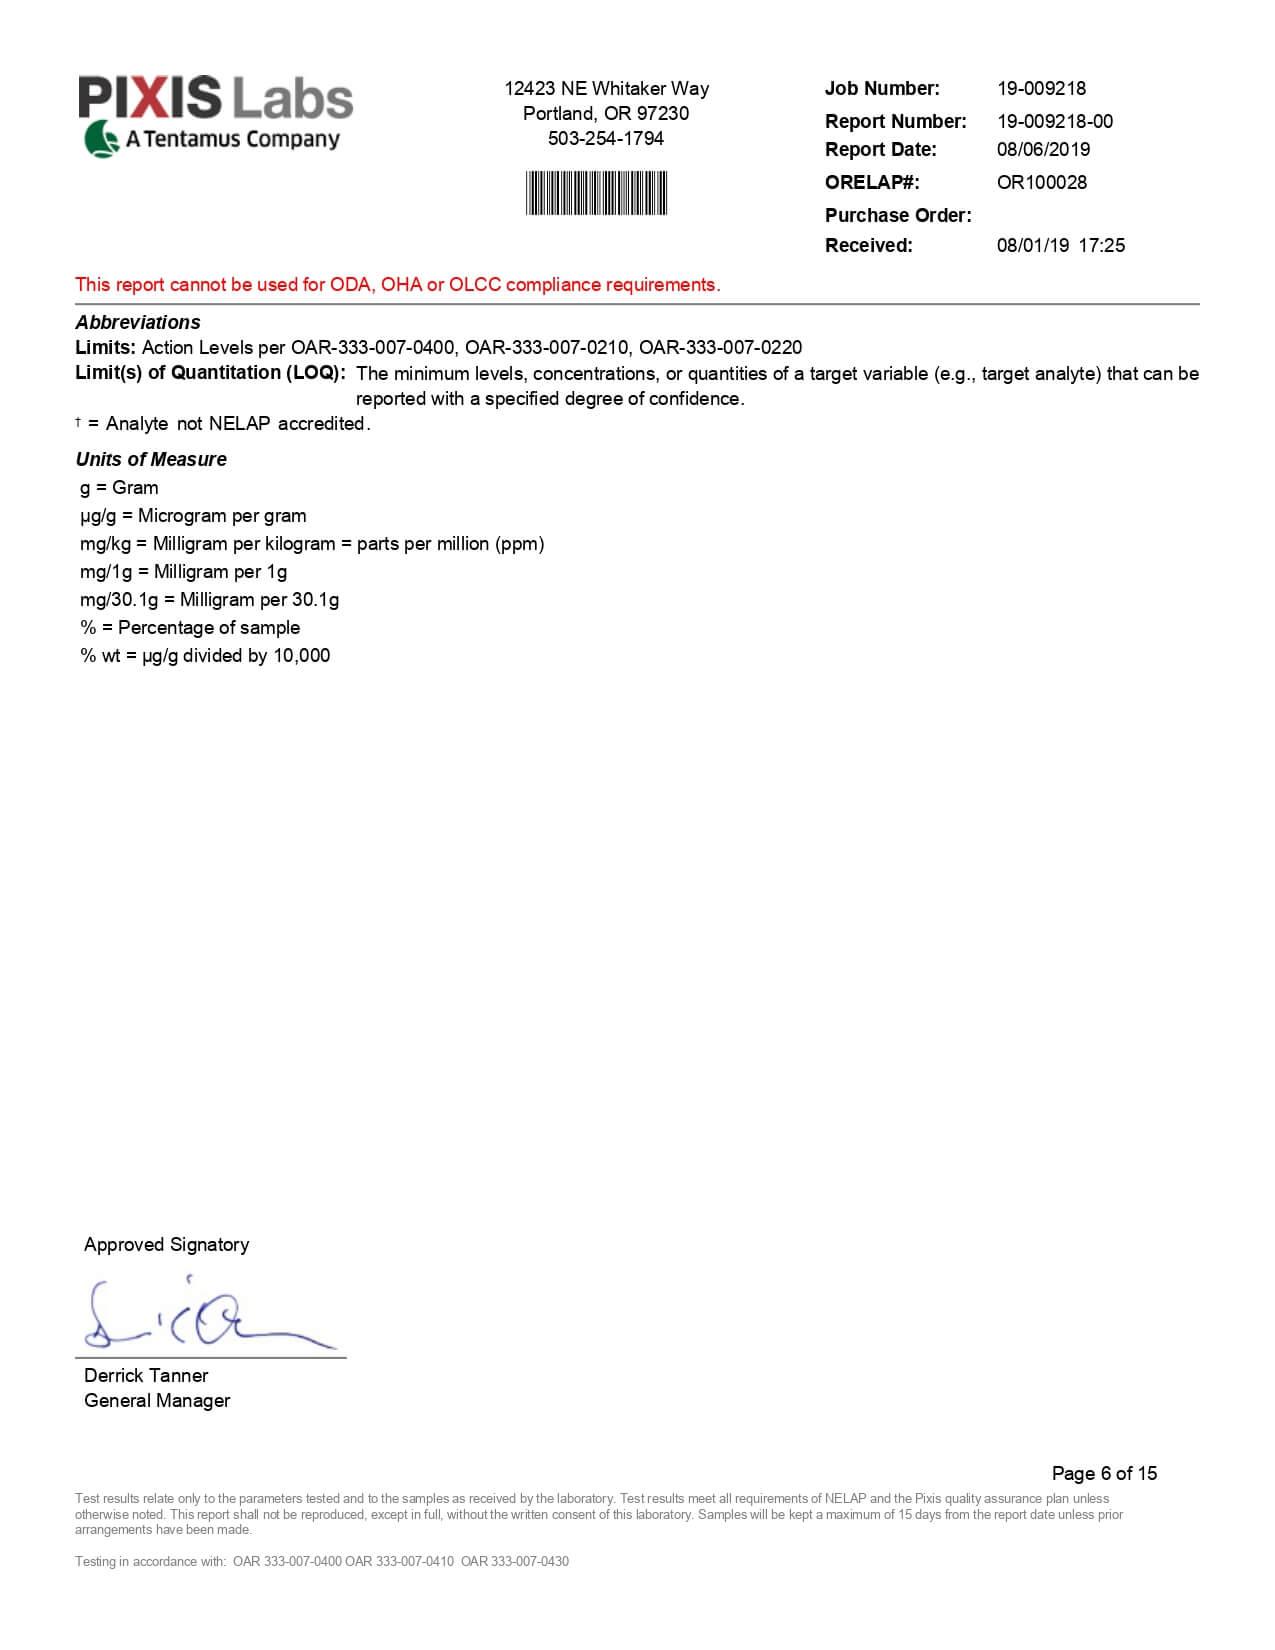 Social CBD Isolate Drops Lavender 500mg Lab Report